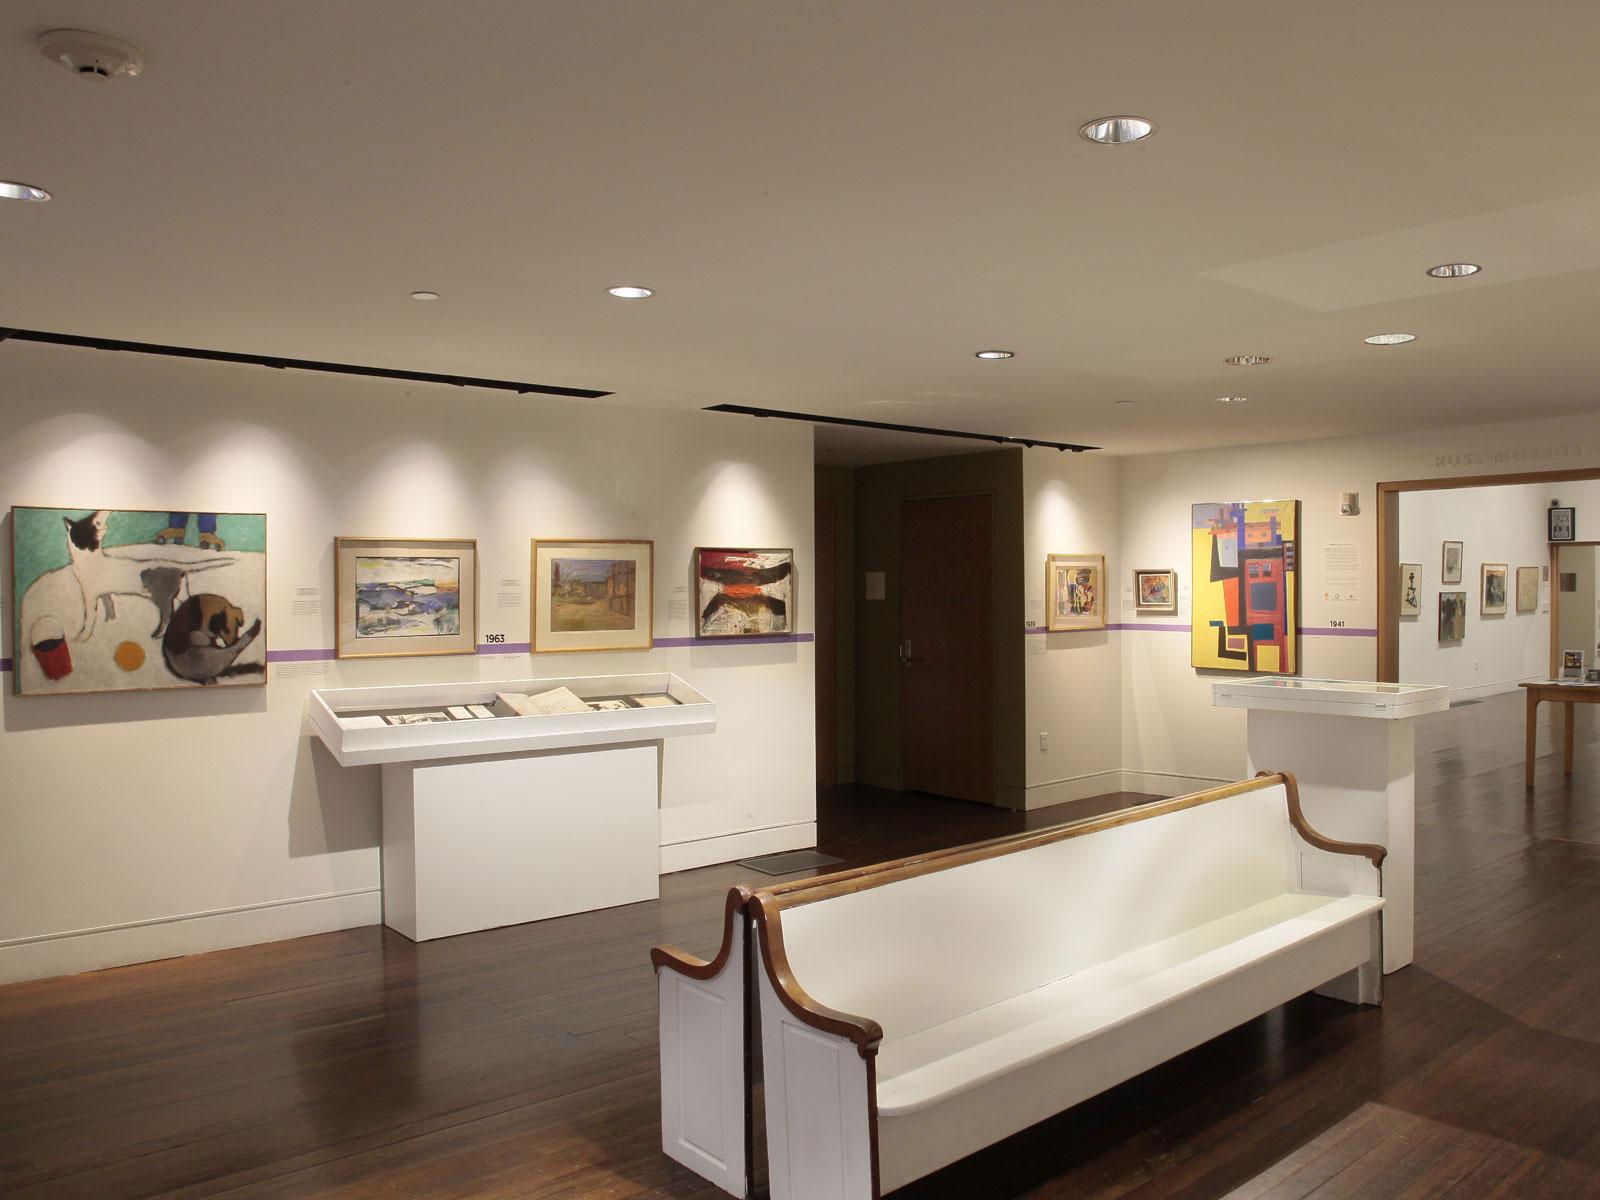 Facility image of Ross Moffett Gallery